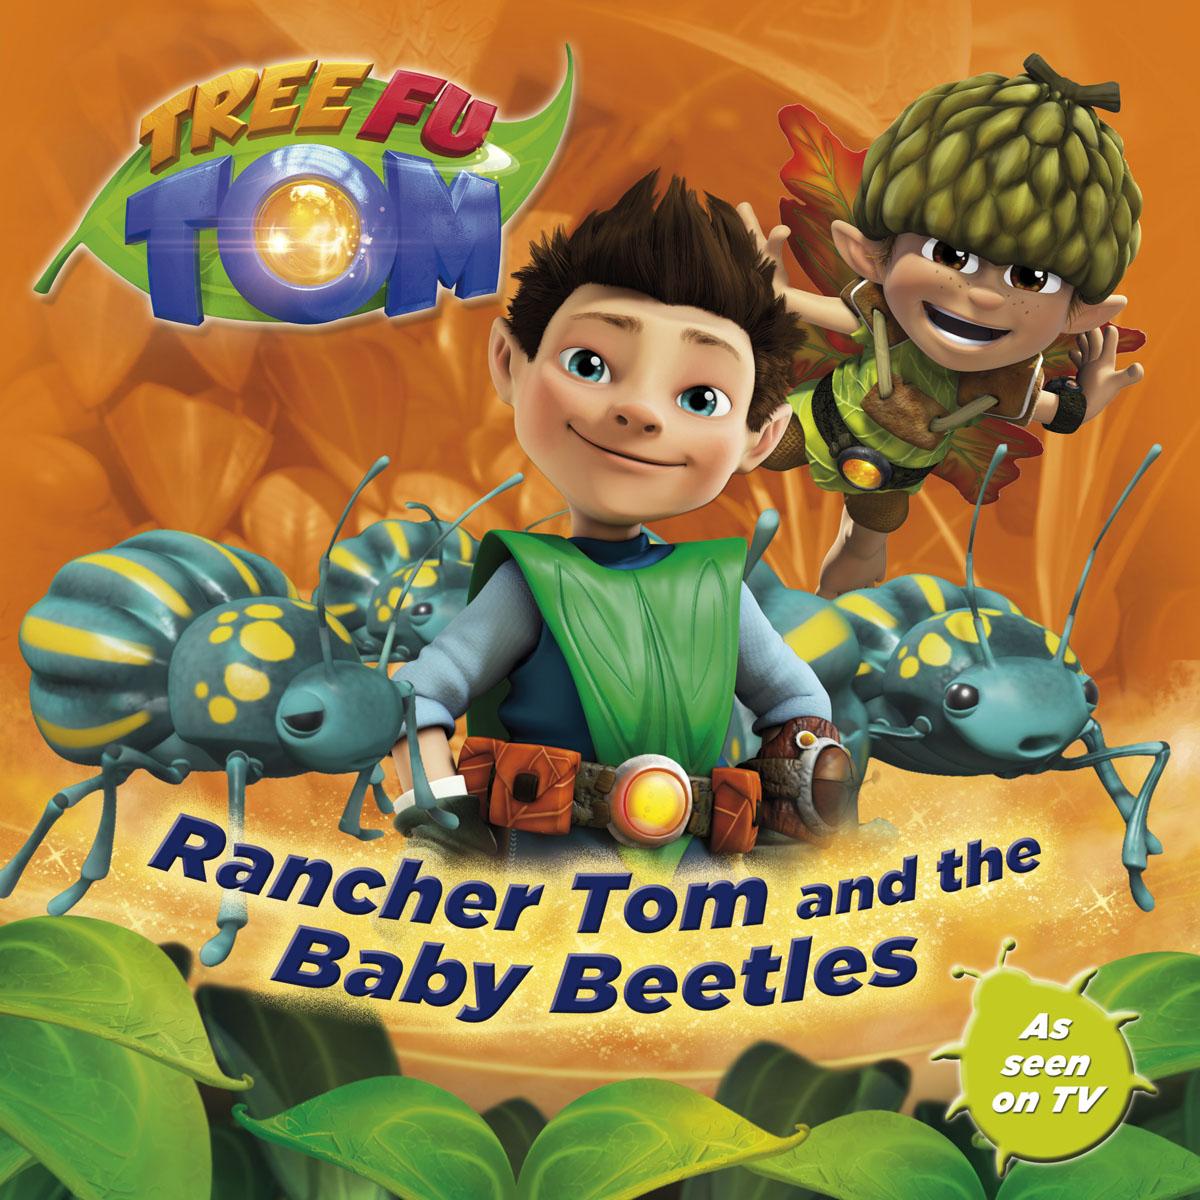 Tree Fu Tom: Rancher Tom and the Baby Beetles наушники накладные sol republic tracks hd white 1241 02